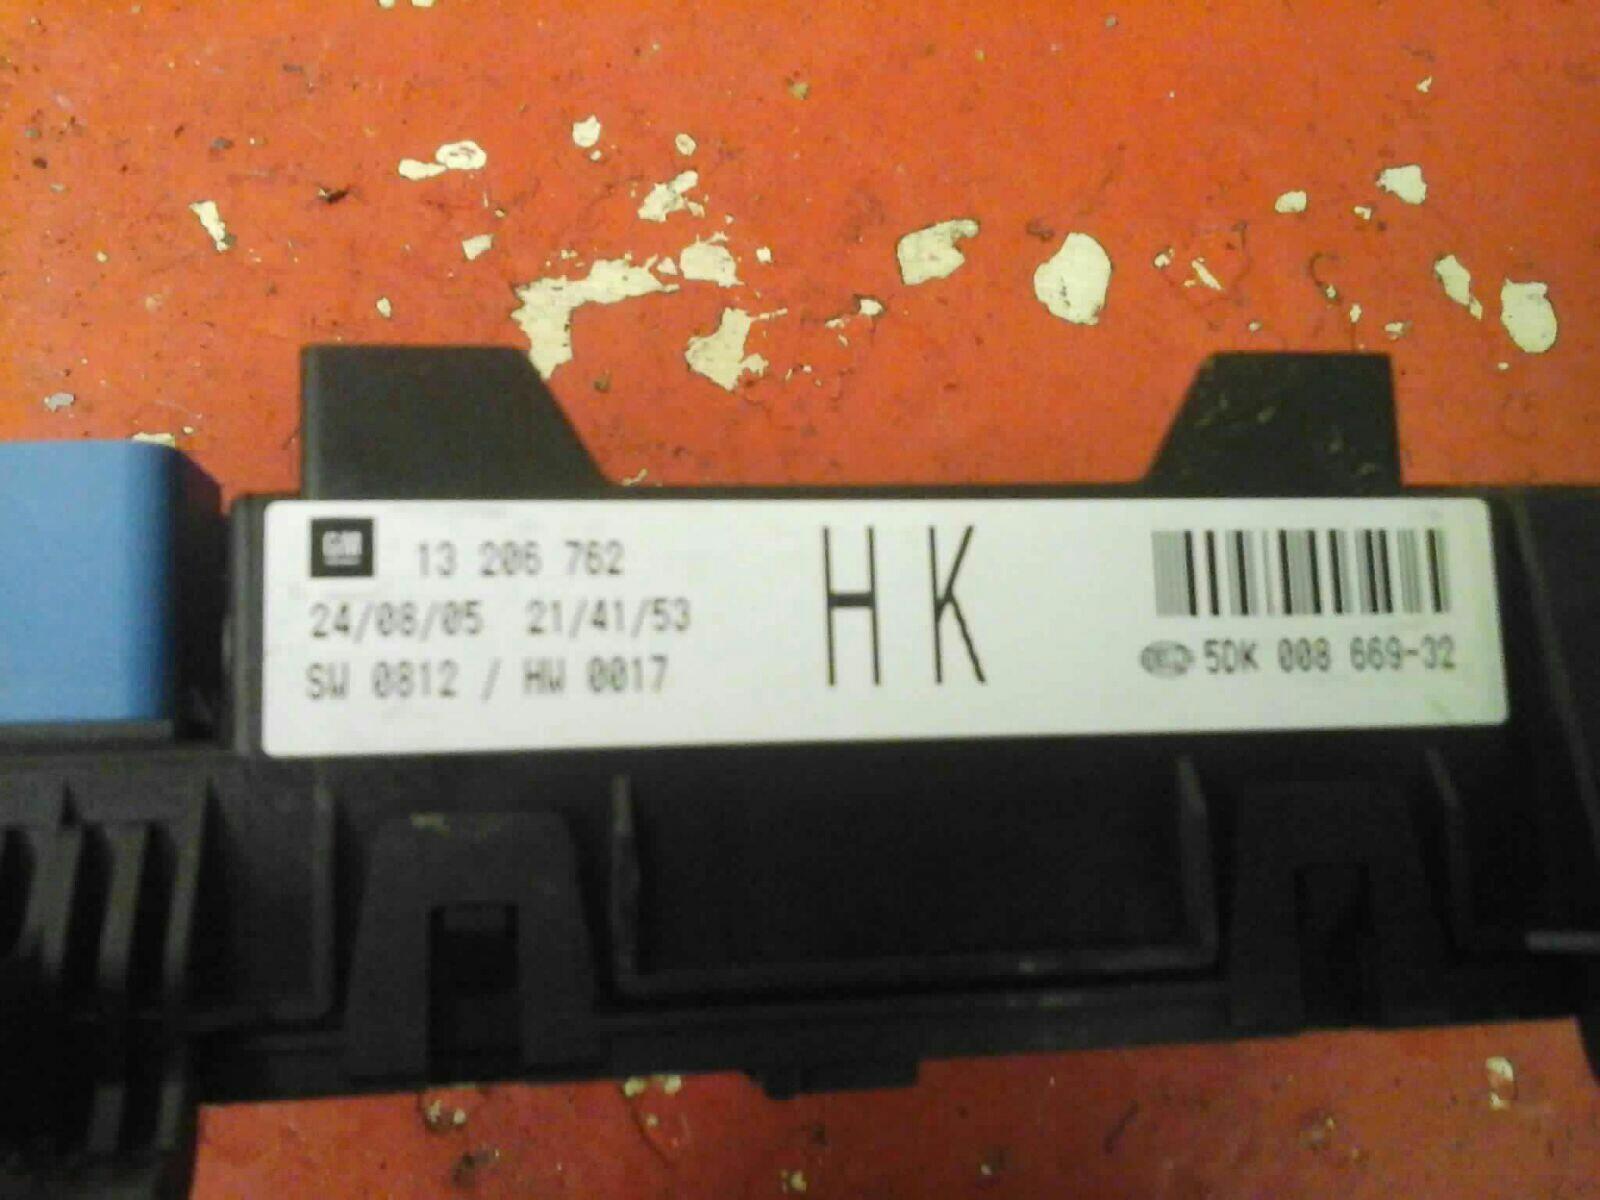 VAUXHALL ASTRA MK5 H + ZAFIRA B REAR ELECTRIC CONTROL REC FUSE BOX HK  2004-2010